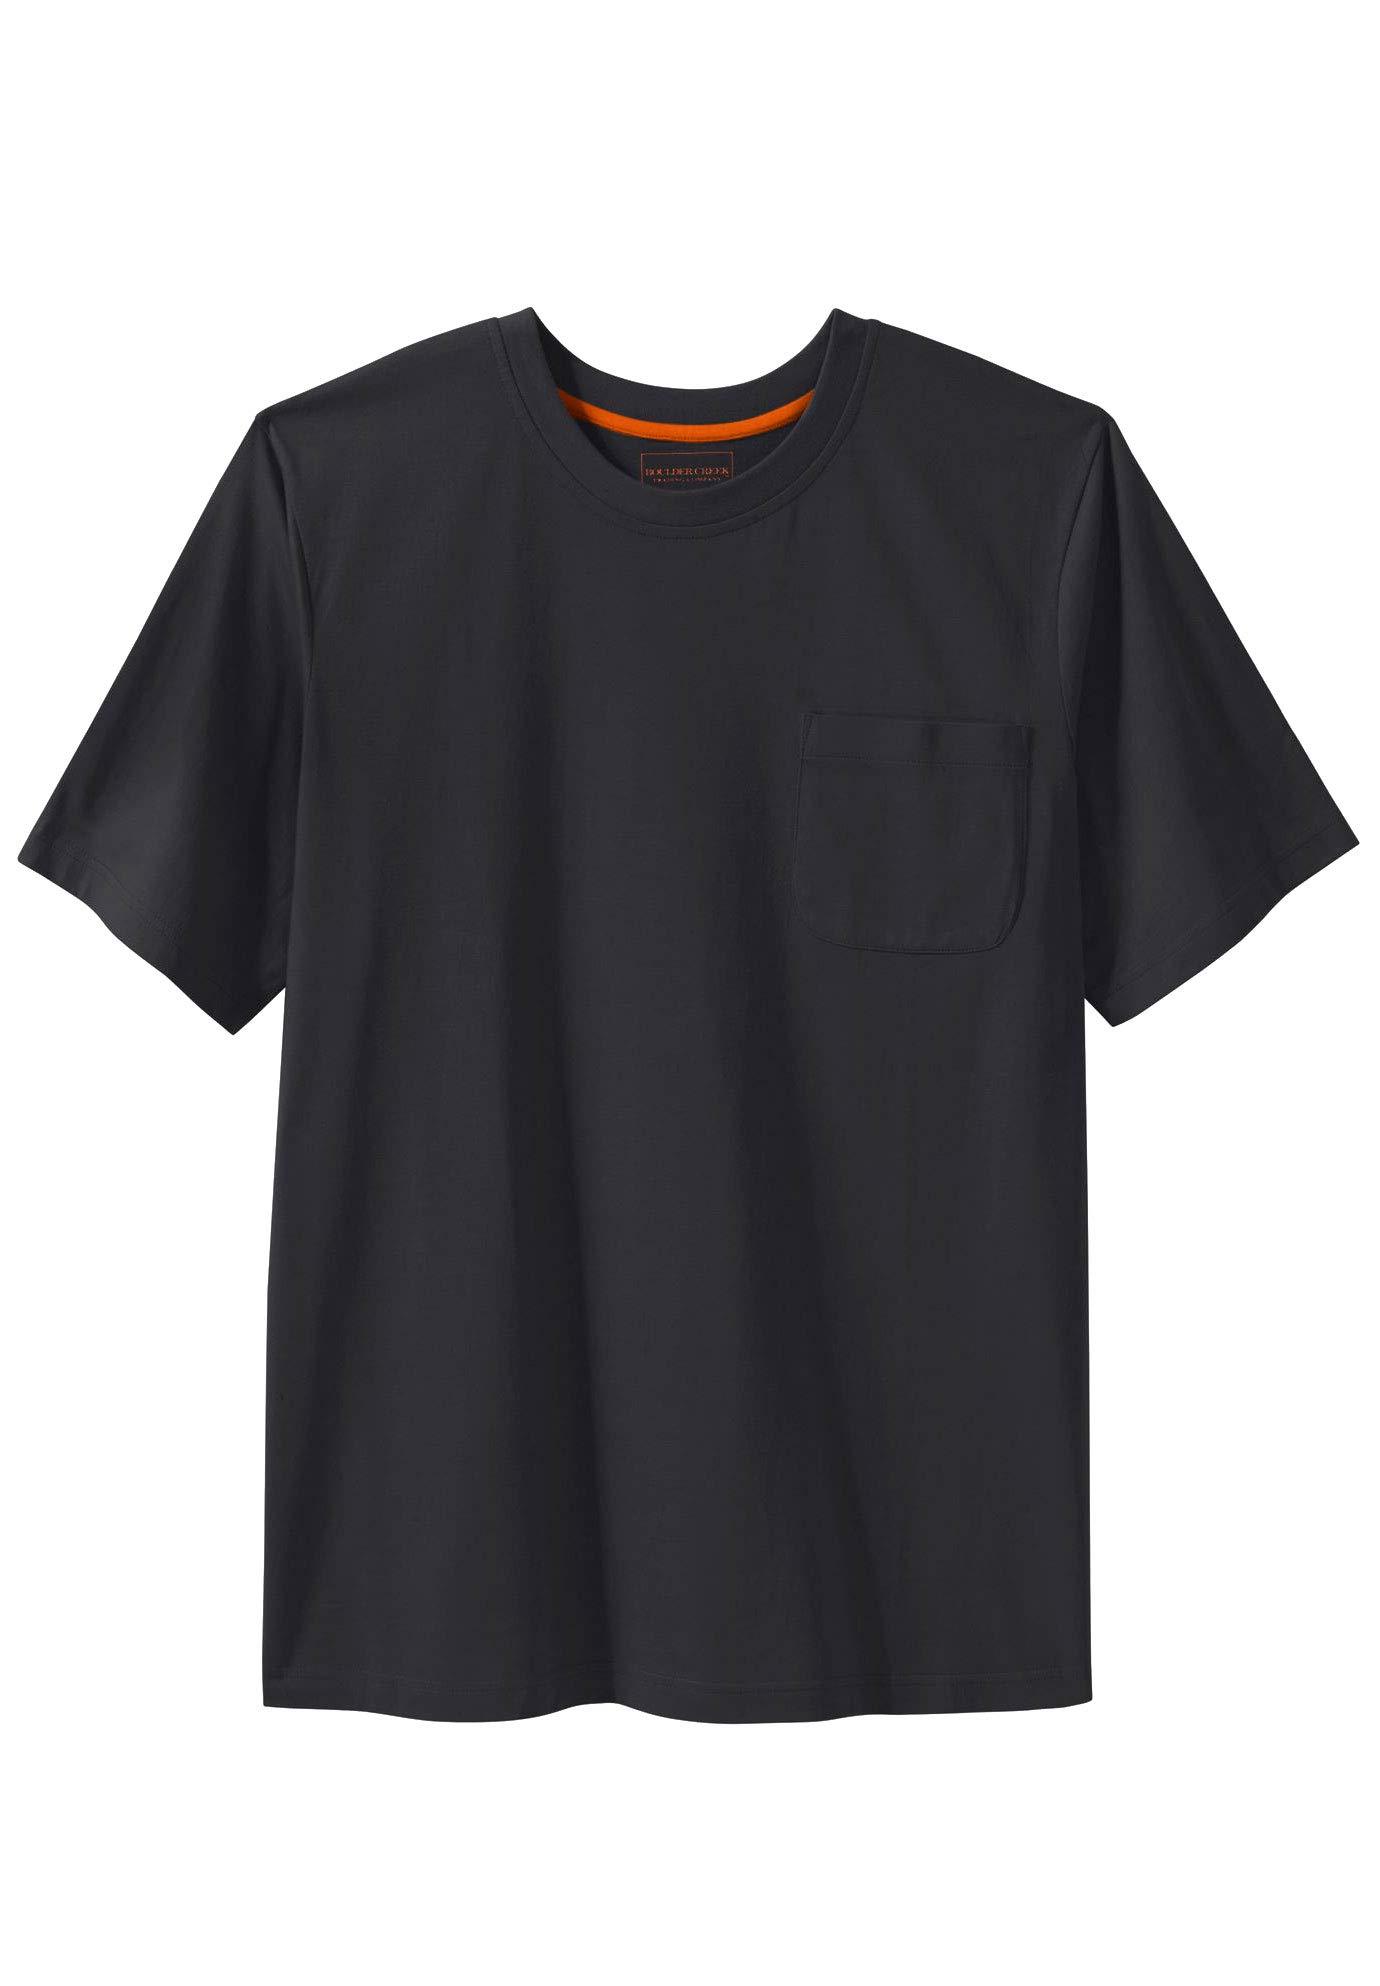 Boulder Creek by Kingsize Men's Big & Tall Heavyweight Crewneck Pocket T-Shirt